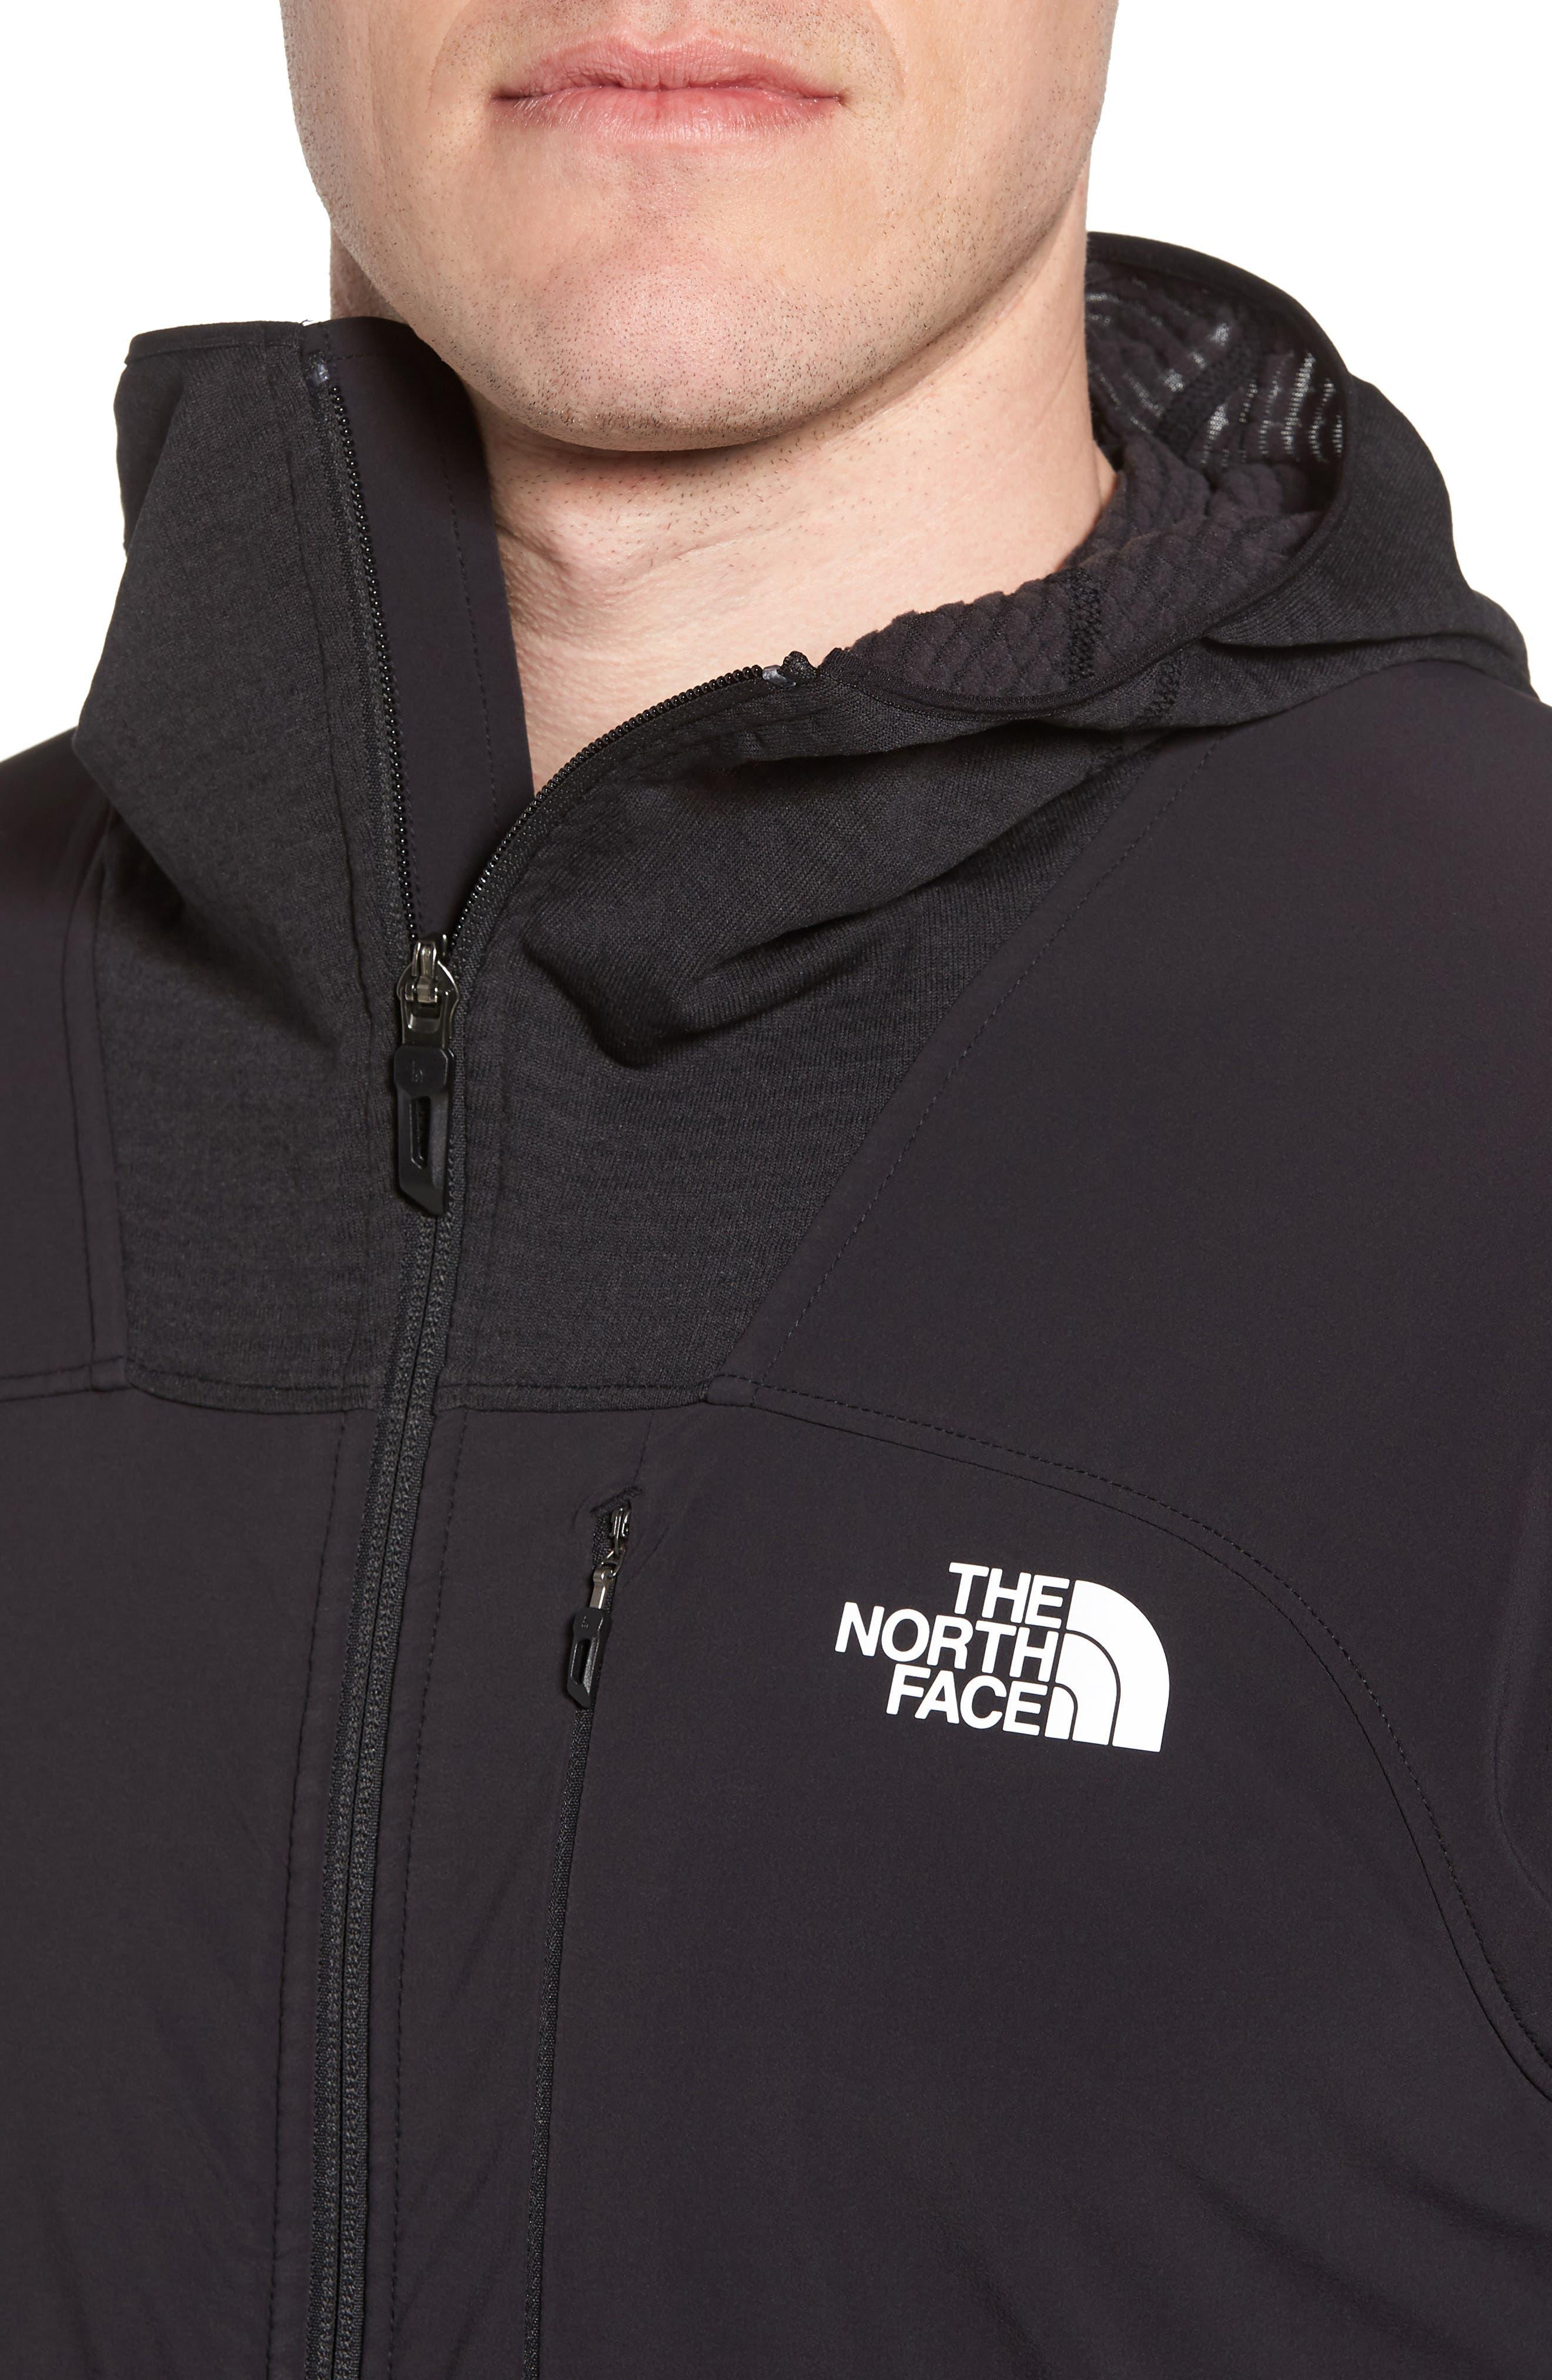 Progressor Power Grid<sup>™</sup> Hooded Fleece Jacket,                             Alternate thumbnail 4, color,                             Black/ Black